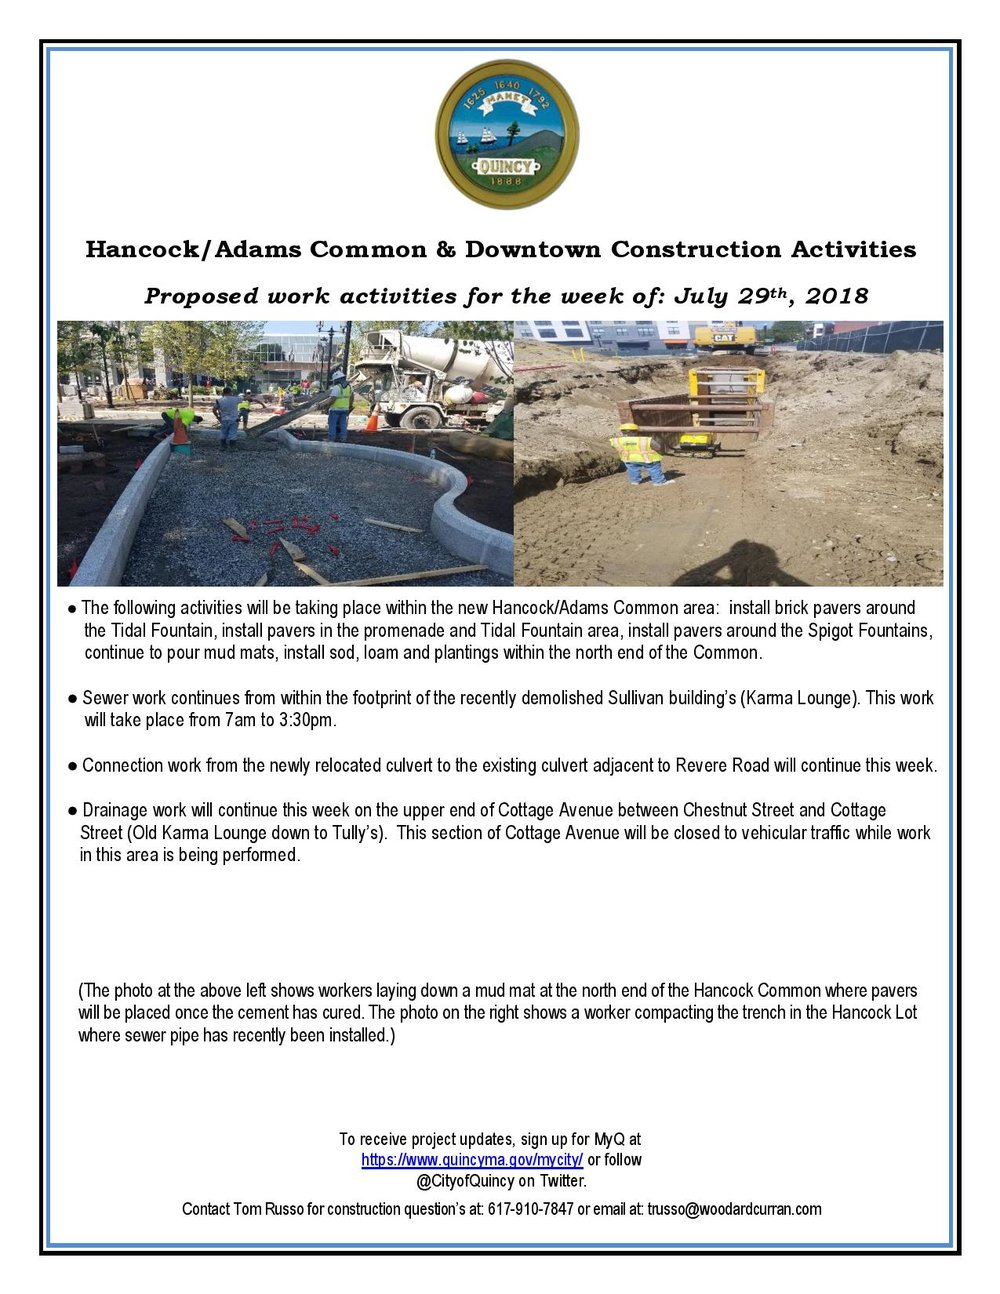 Hancock-Adams Green Flyer 7-29-2018-page-001.jpg